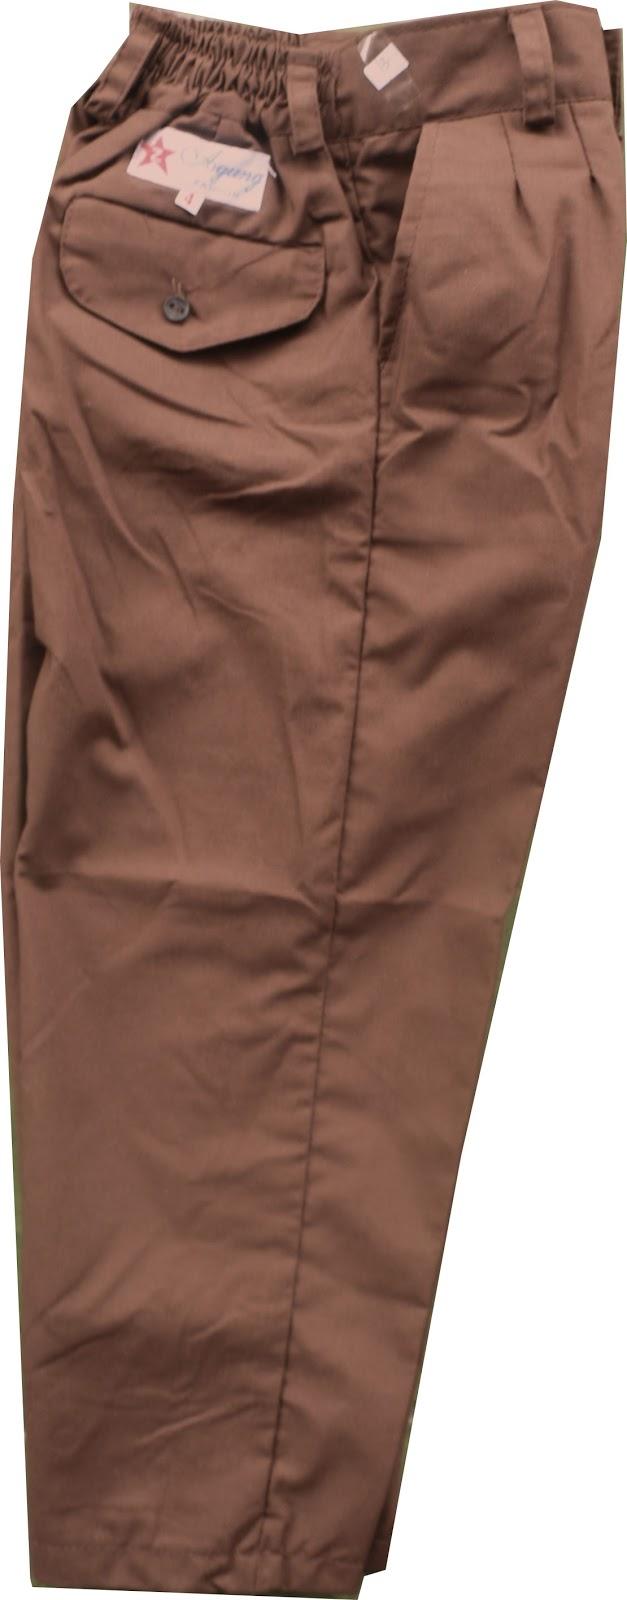 Celana Pramuka Panjang SMP uk L3,L4